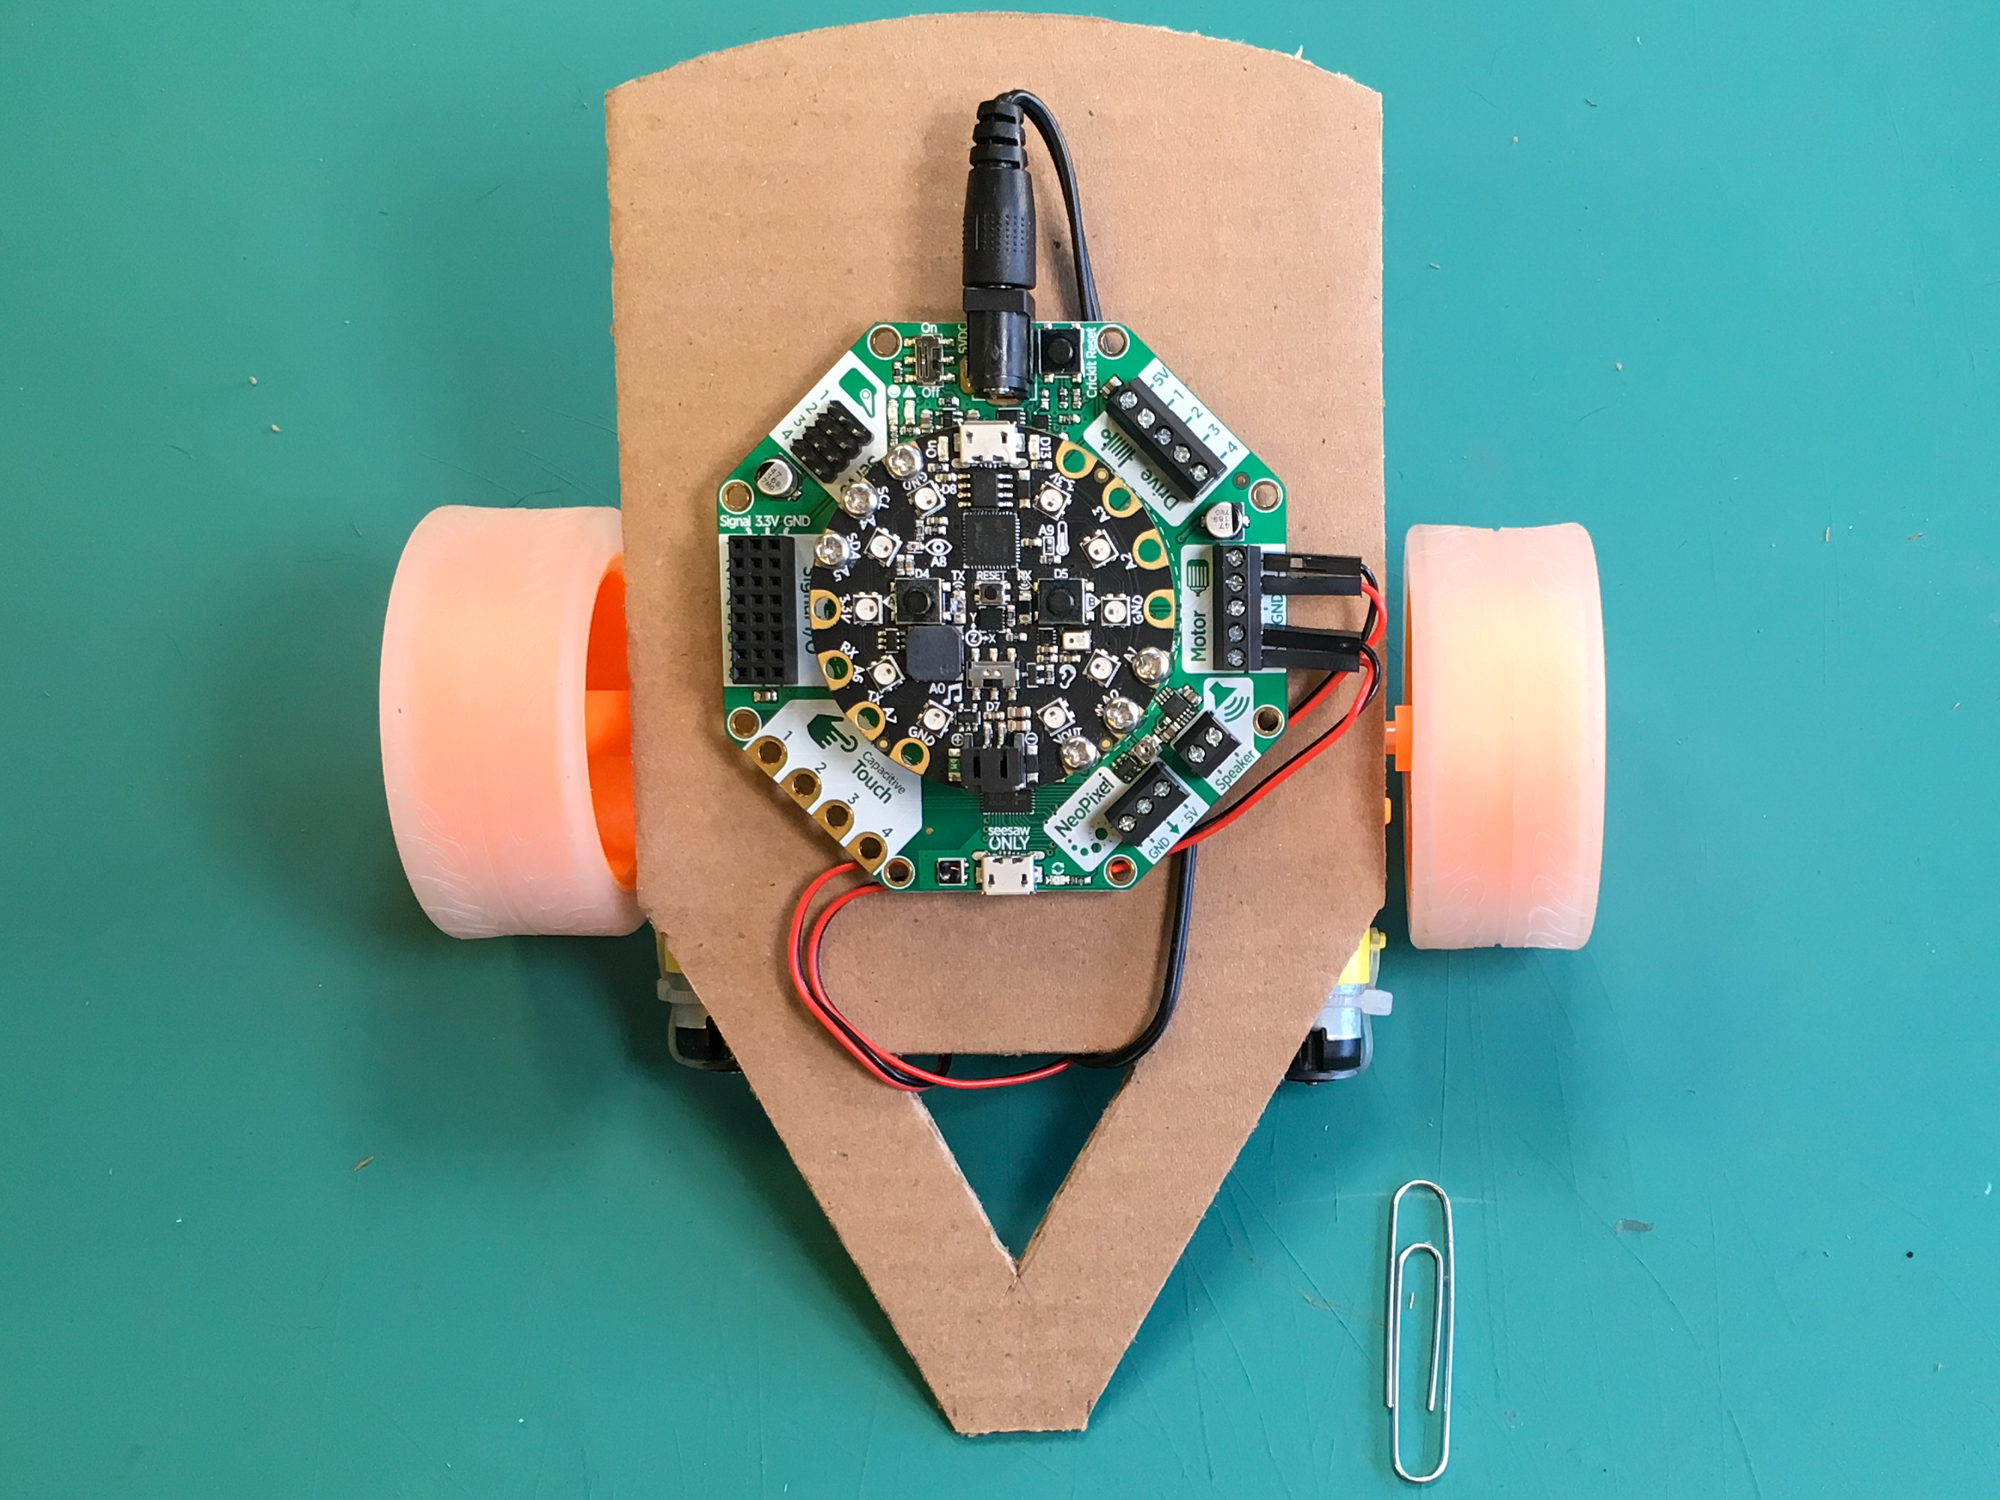 robotics___cnc_bumperBot_IMG_3492_2k.jpg